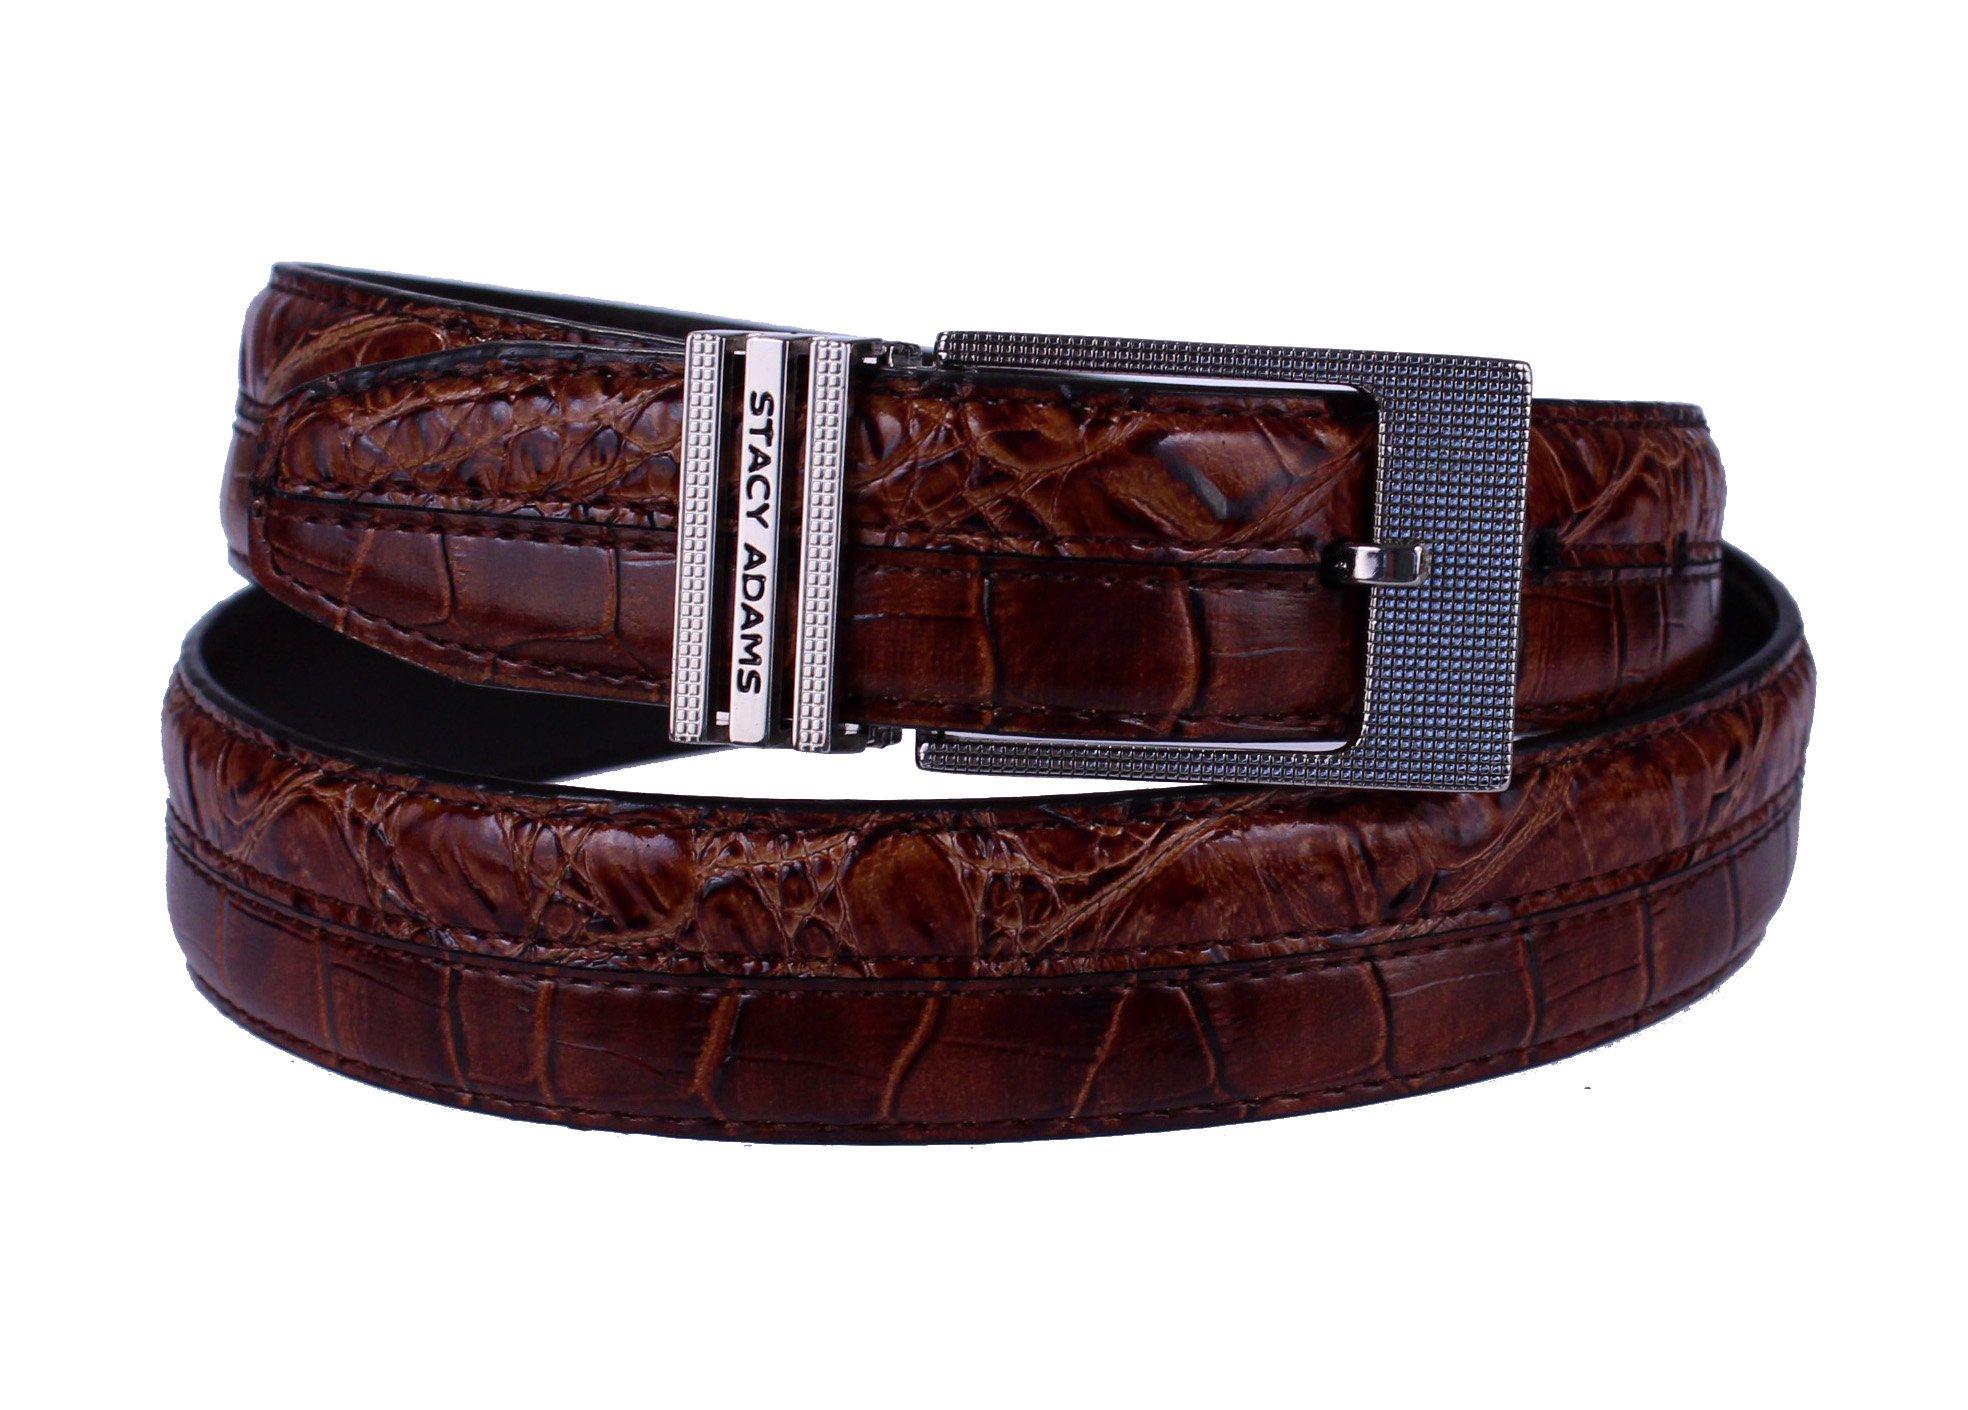 Stacy Adams 6-179 Hornback and Croco Embossed Mens Adjustable Belt with Metal Keep, Polished Nickle Buckle (36, Cognac)